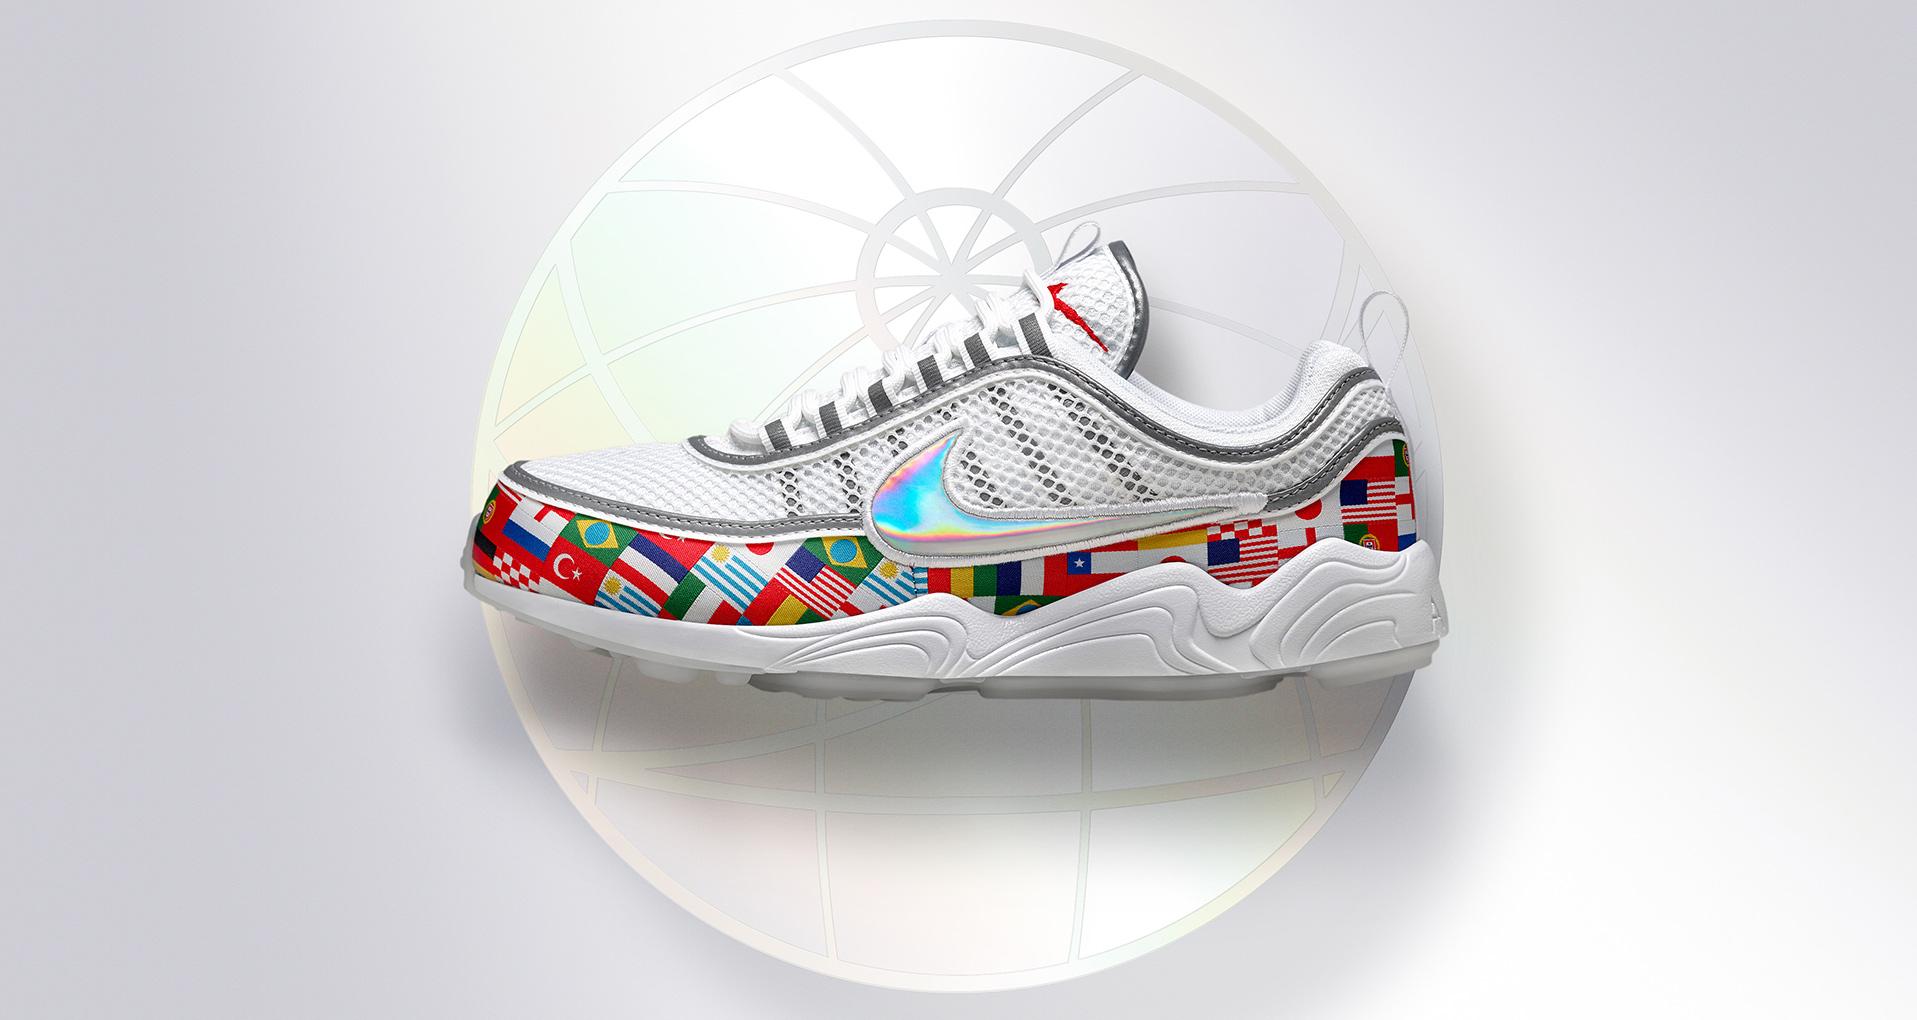 Nike, One World, Air Zoom Spiridon